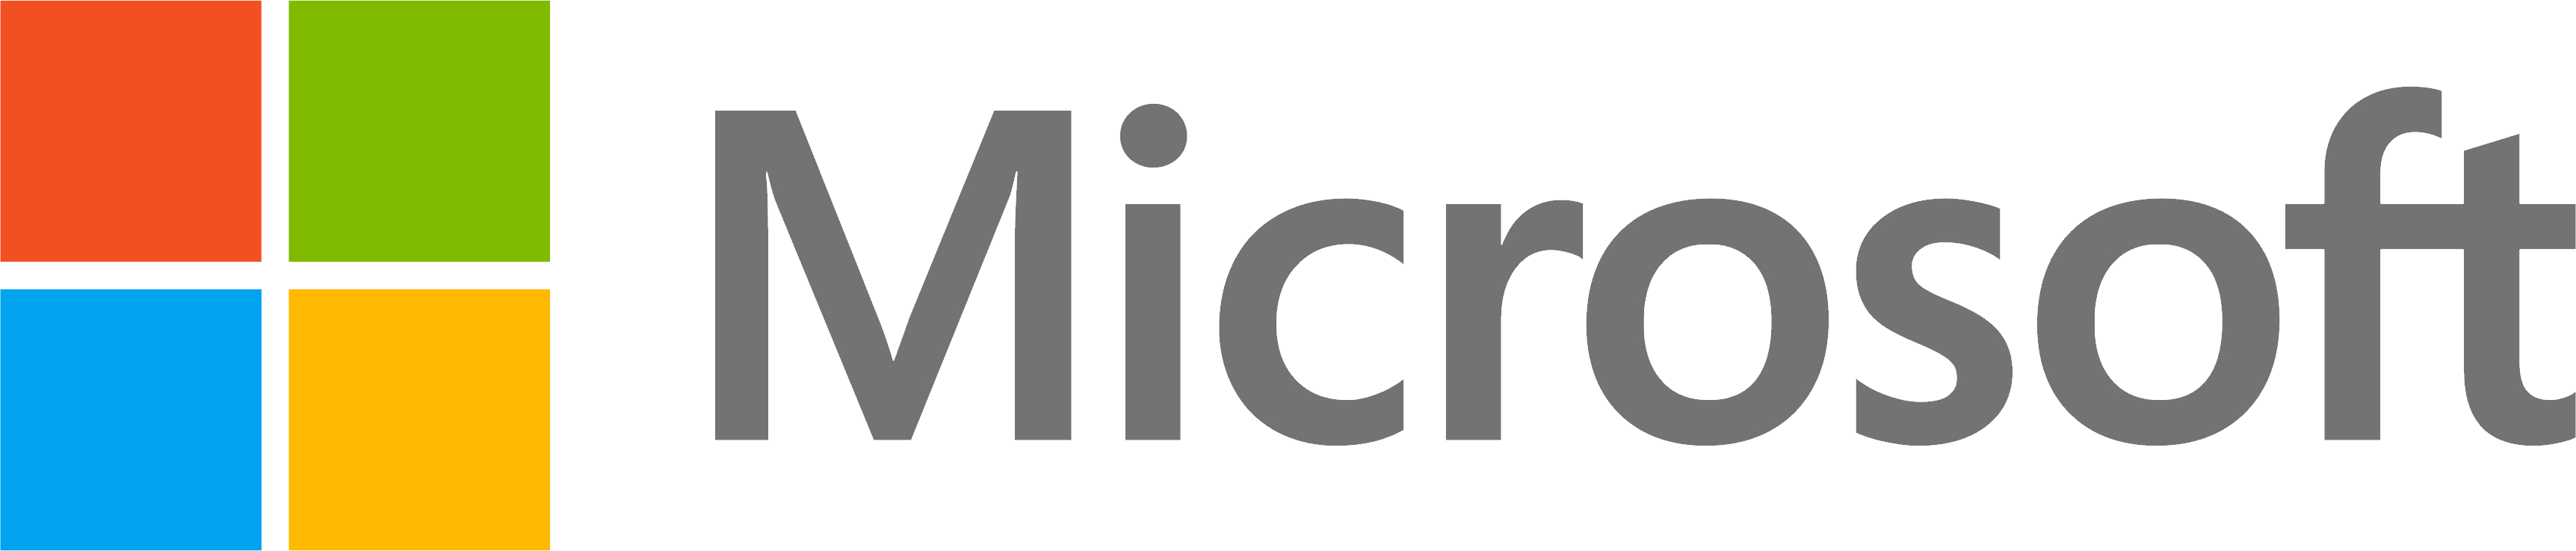 https://techsuccess.com.au/wp-content/uploads/2018/06/microsoft_logo.png